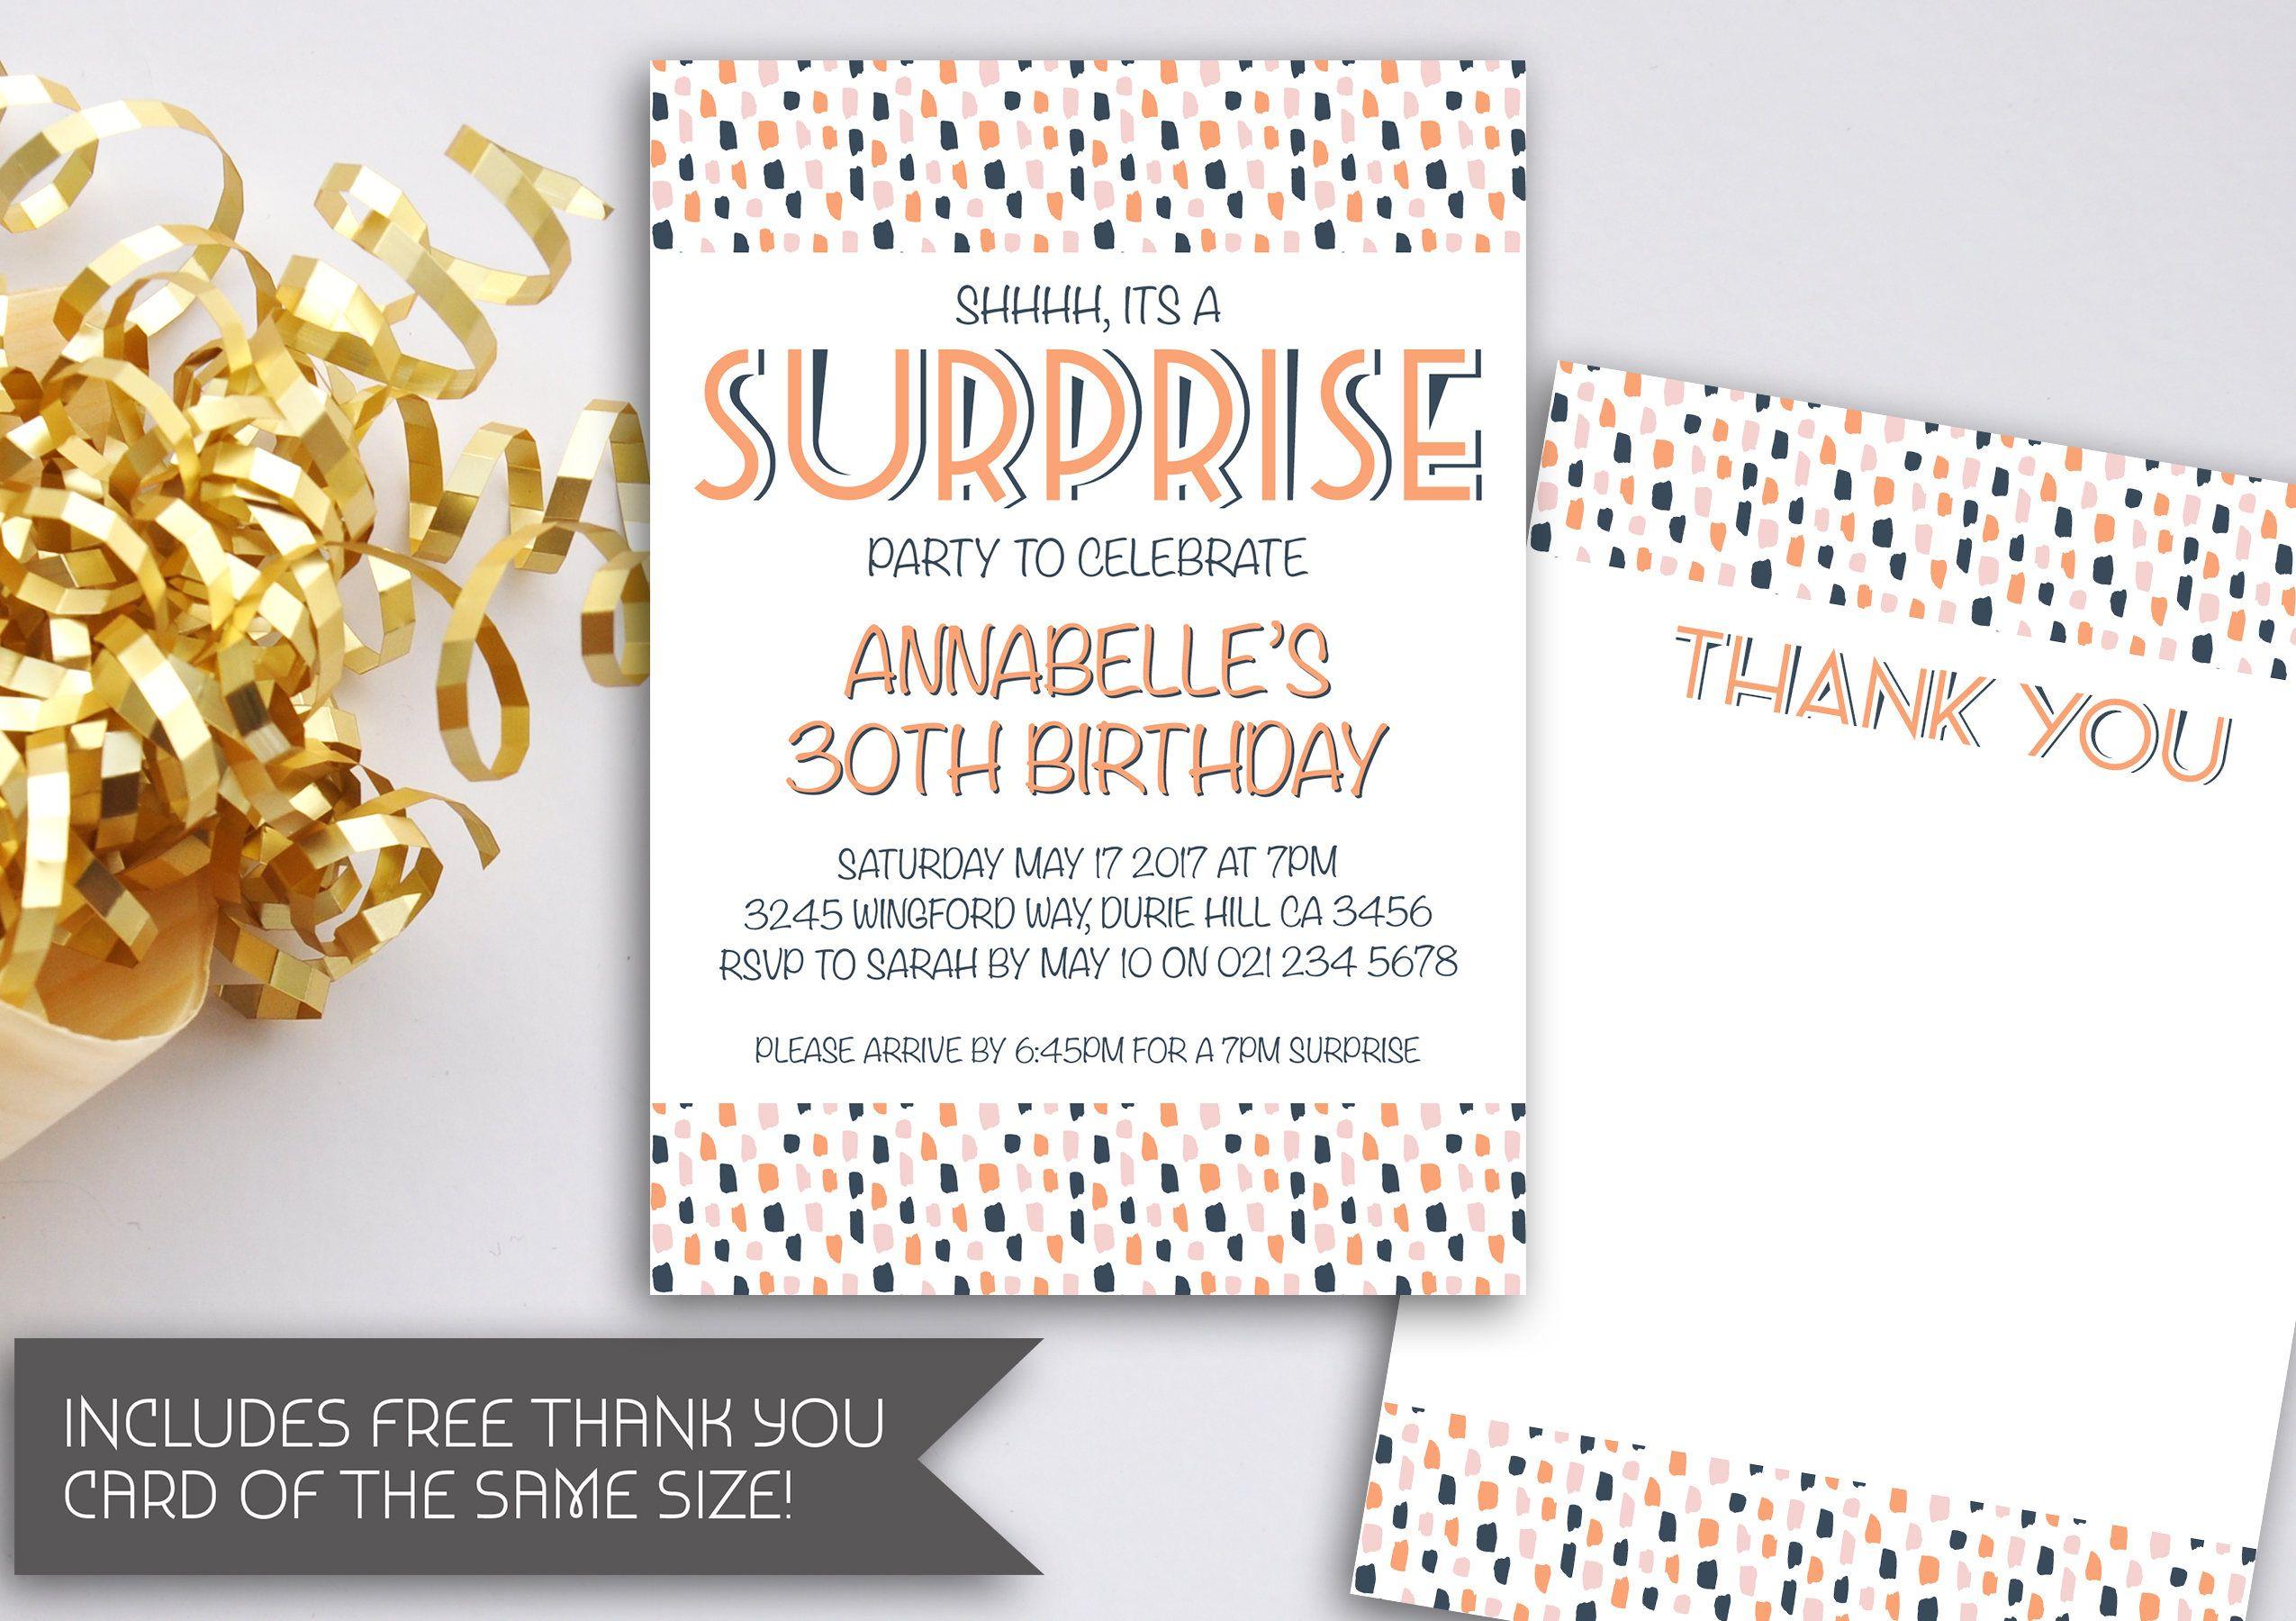 Surprise Birthday Invitation | Surprise Party Invitation | Art Deco ...